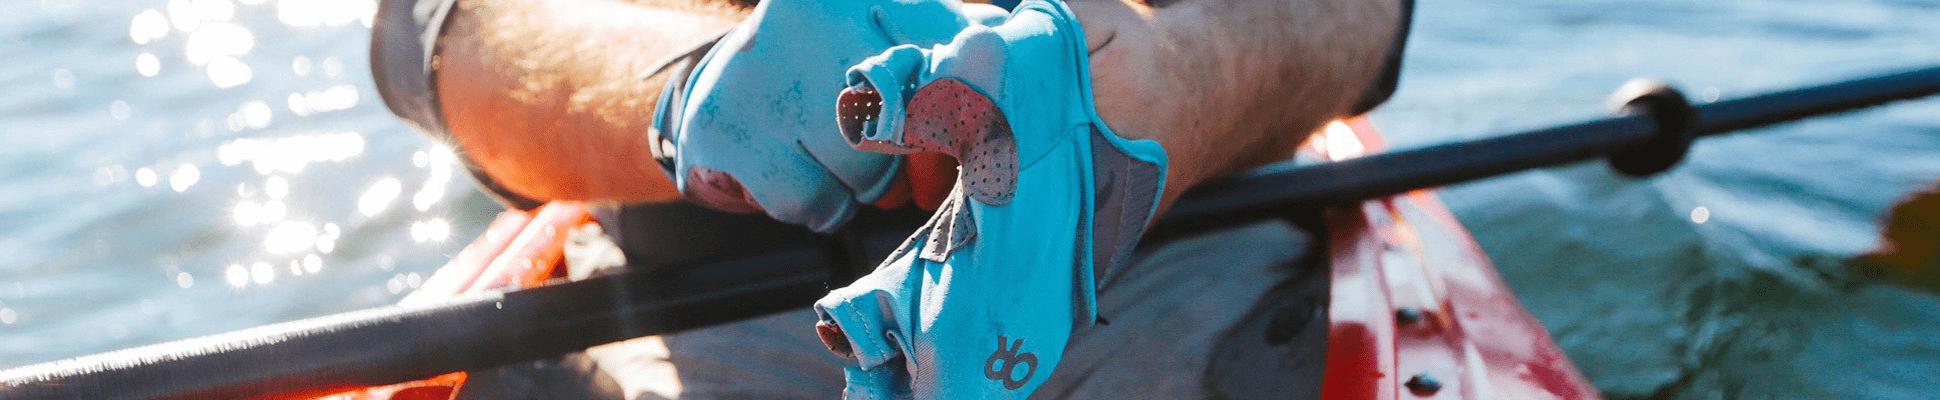 Sun Protection Gloves